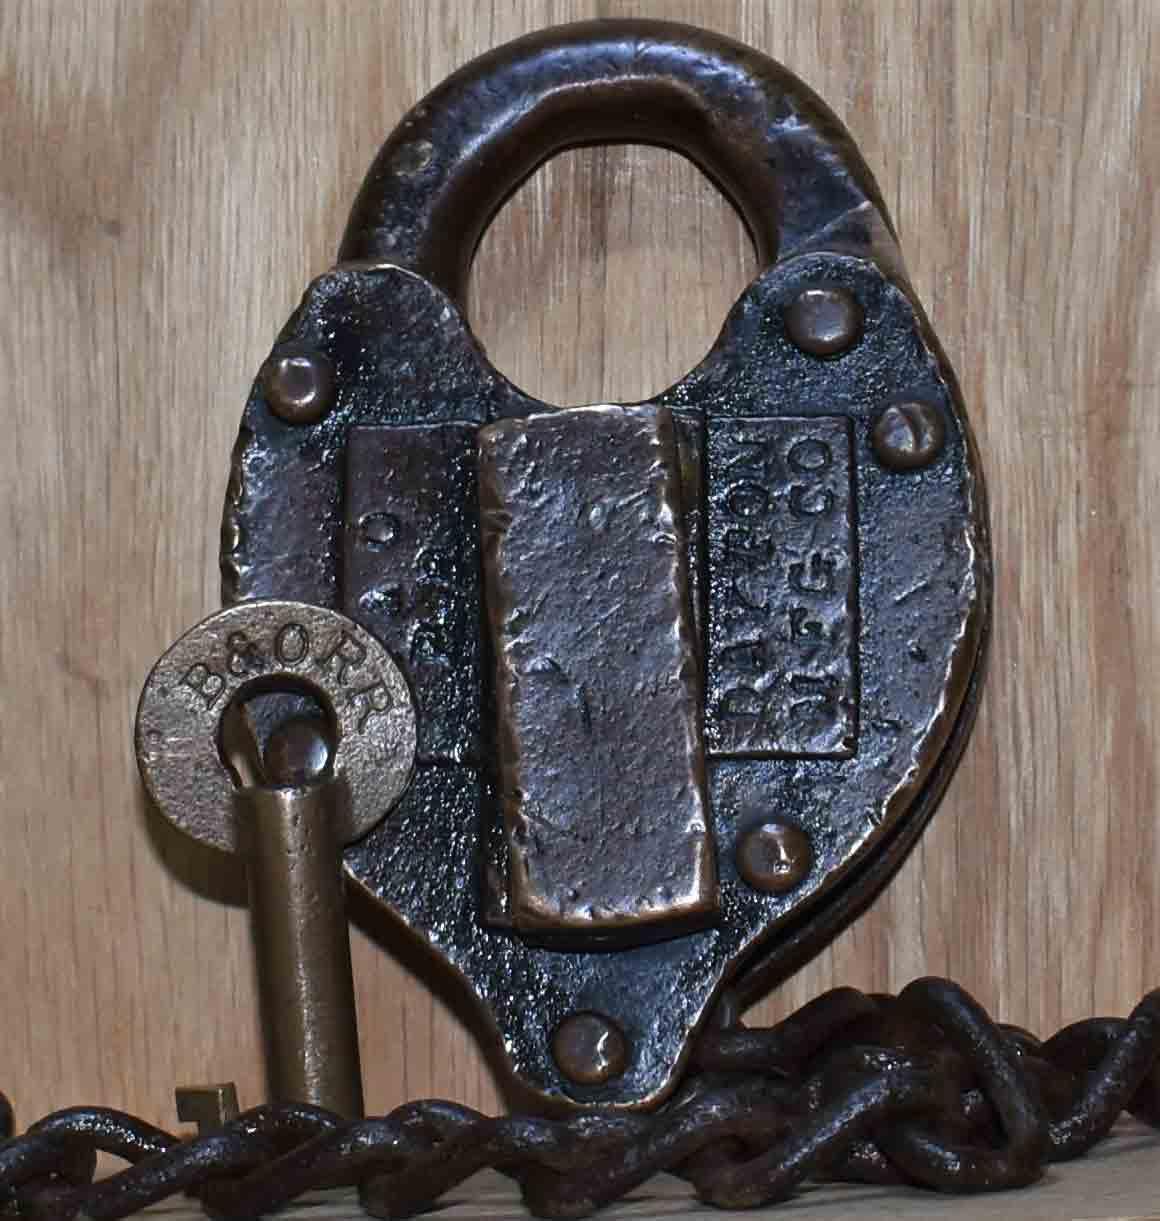 Railroad Switch Keys And Locks